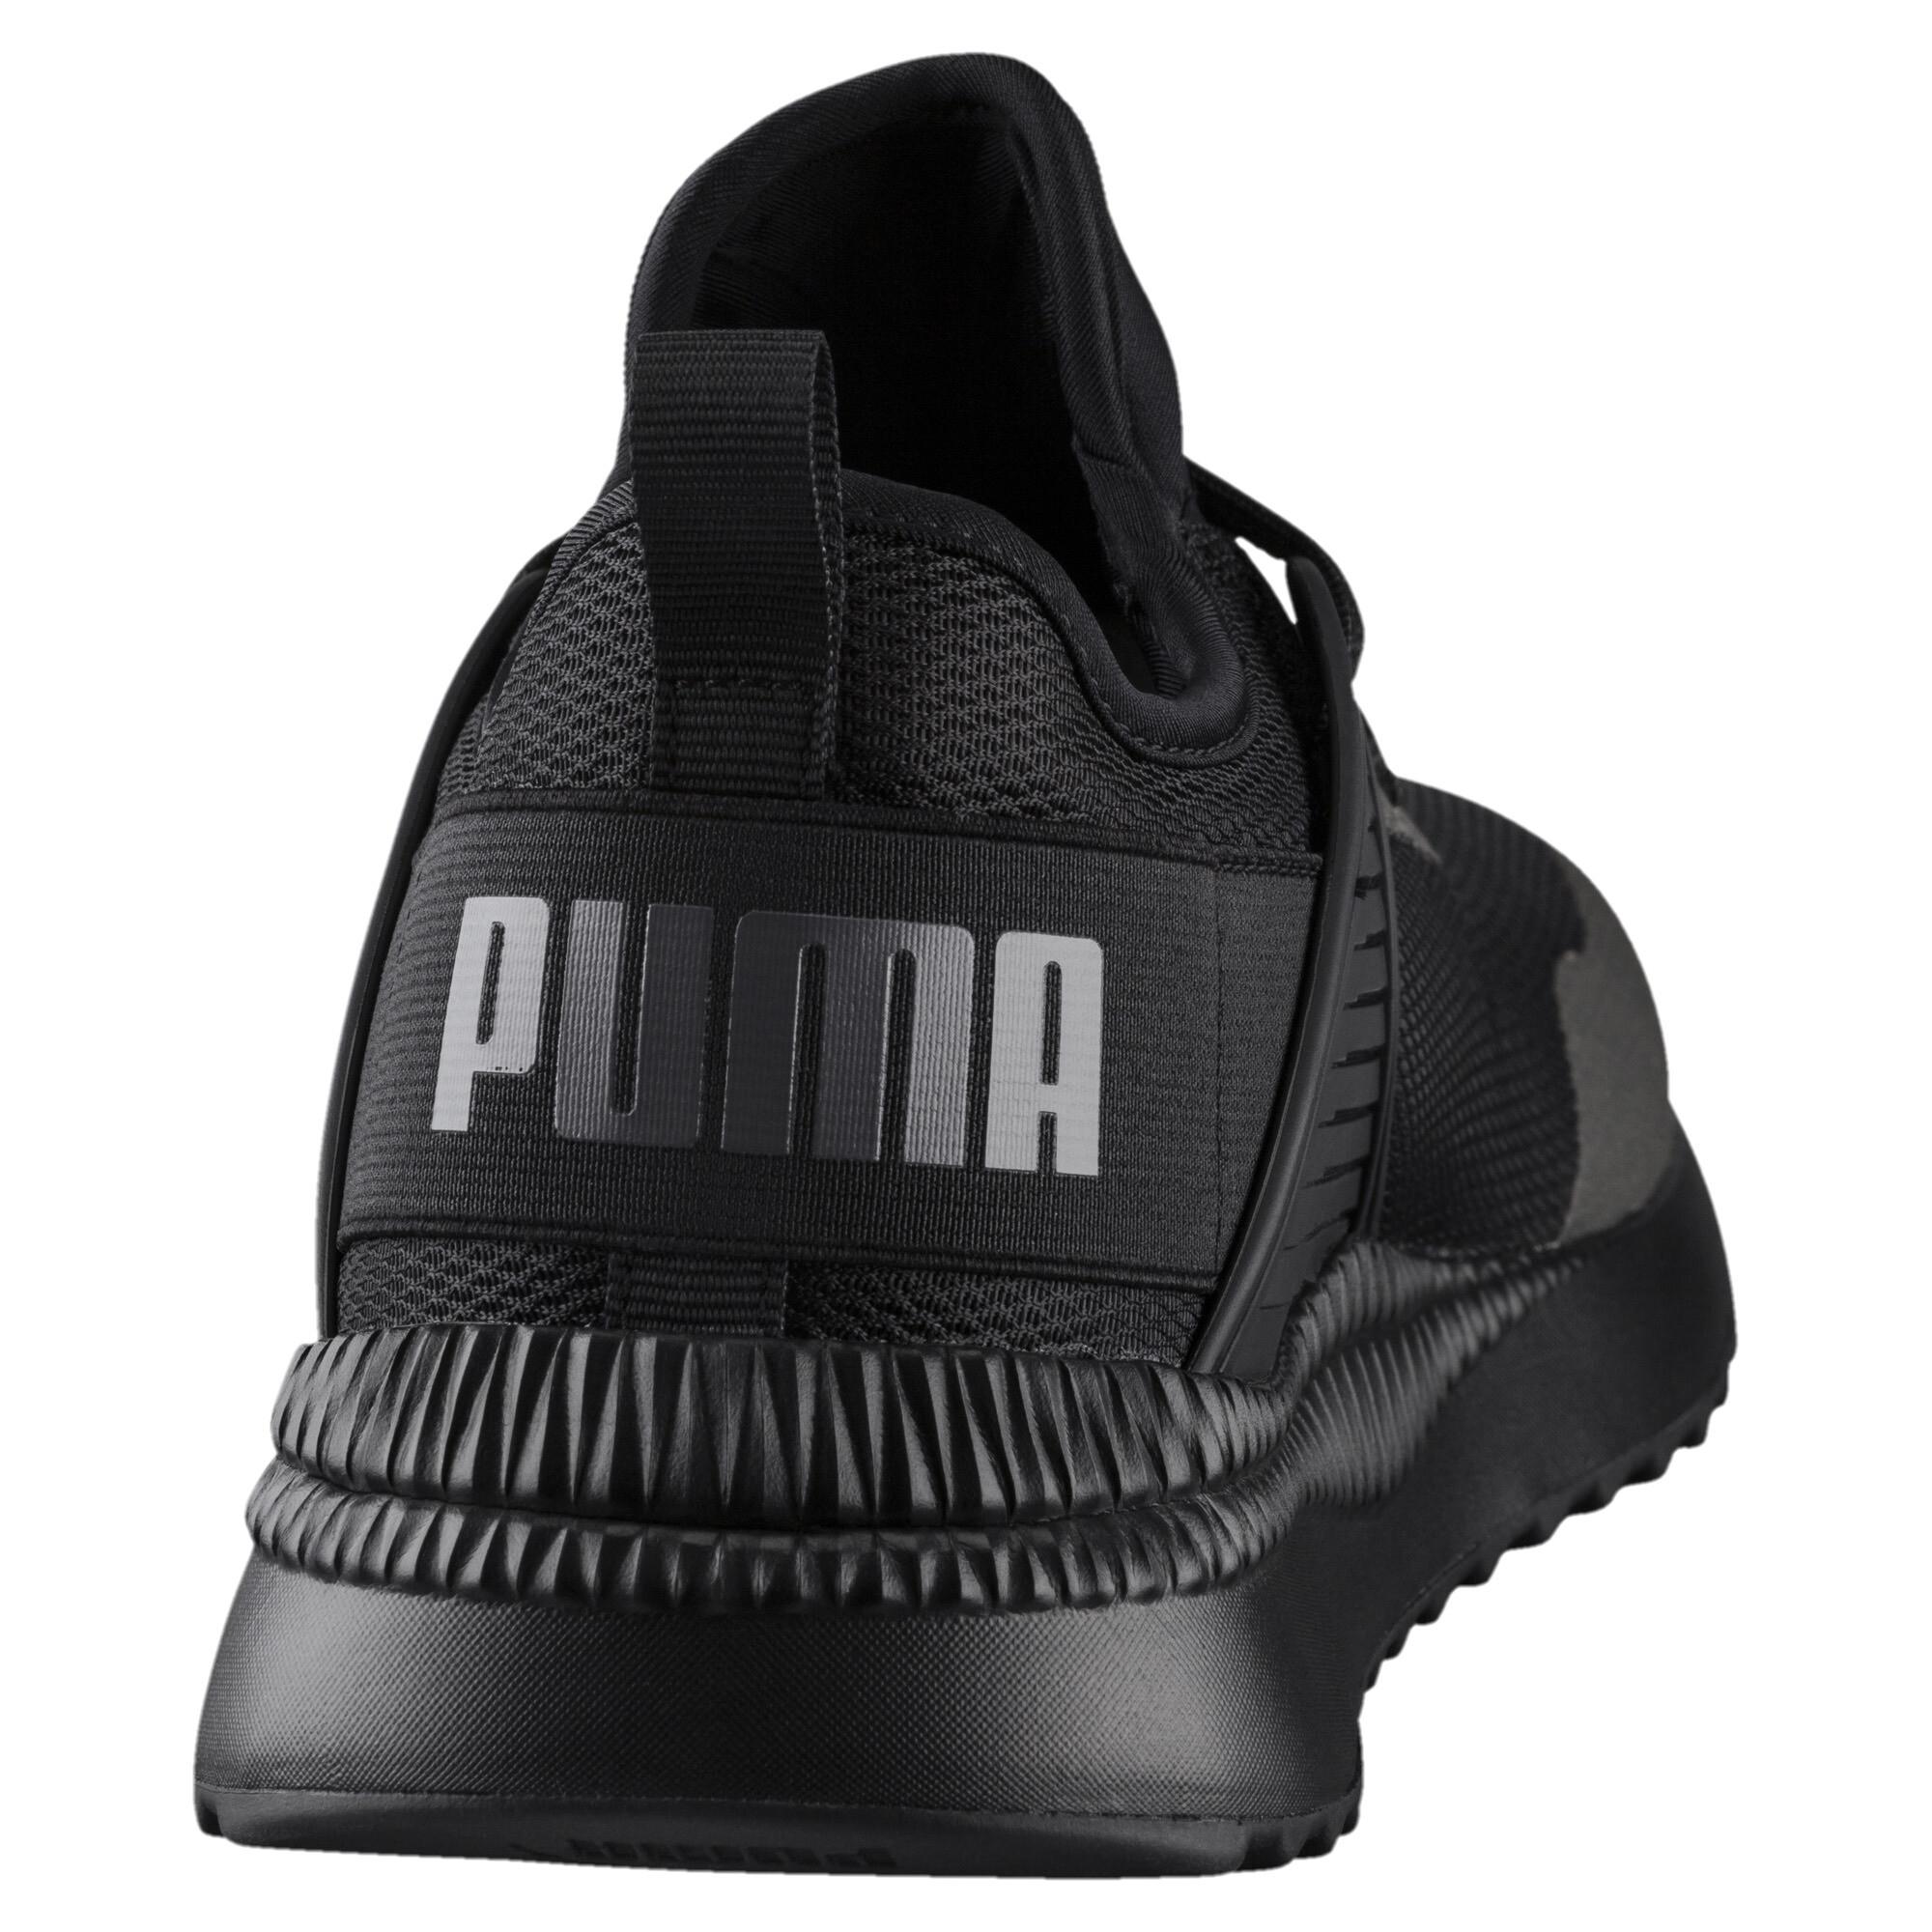 PUMA-Pacer-Next-Cage-Sneakers-Men-Shoe-Basics thumbnail 3